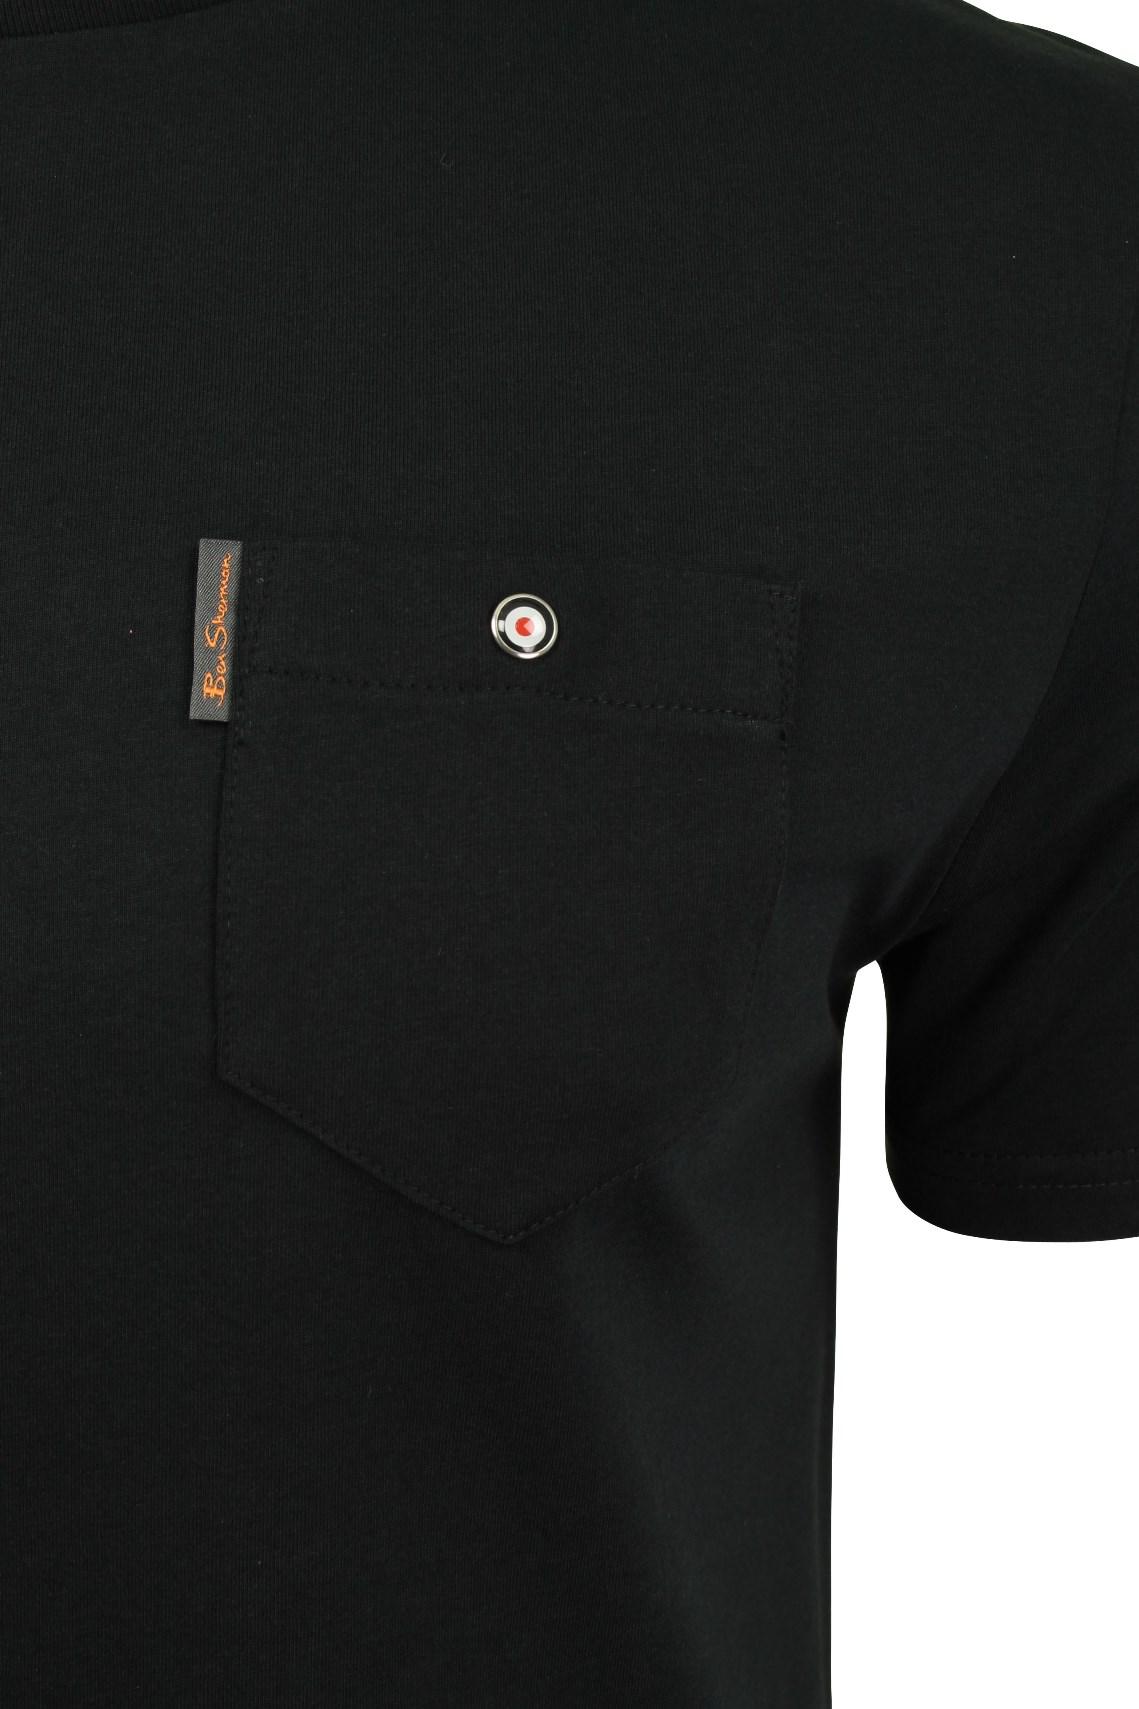 Mens-Classic-Spade-Pocket-T-Shirt-by-Ben-Sherman thumbnail 4